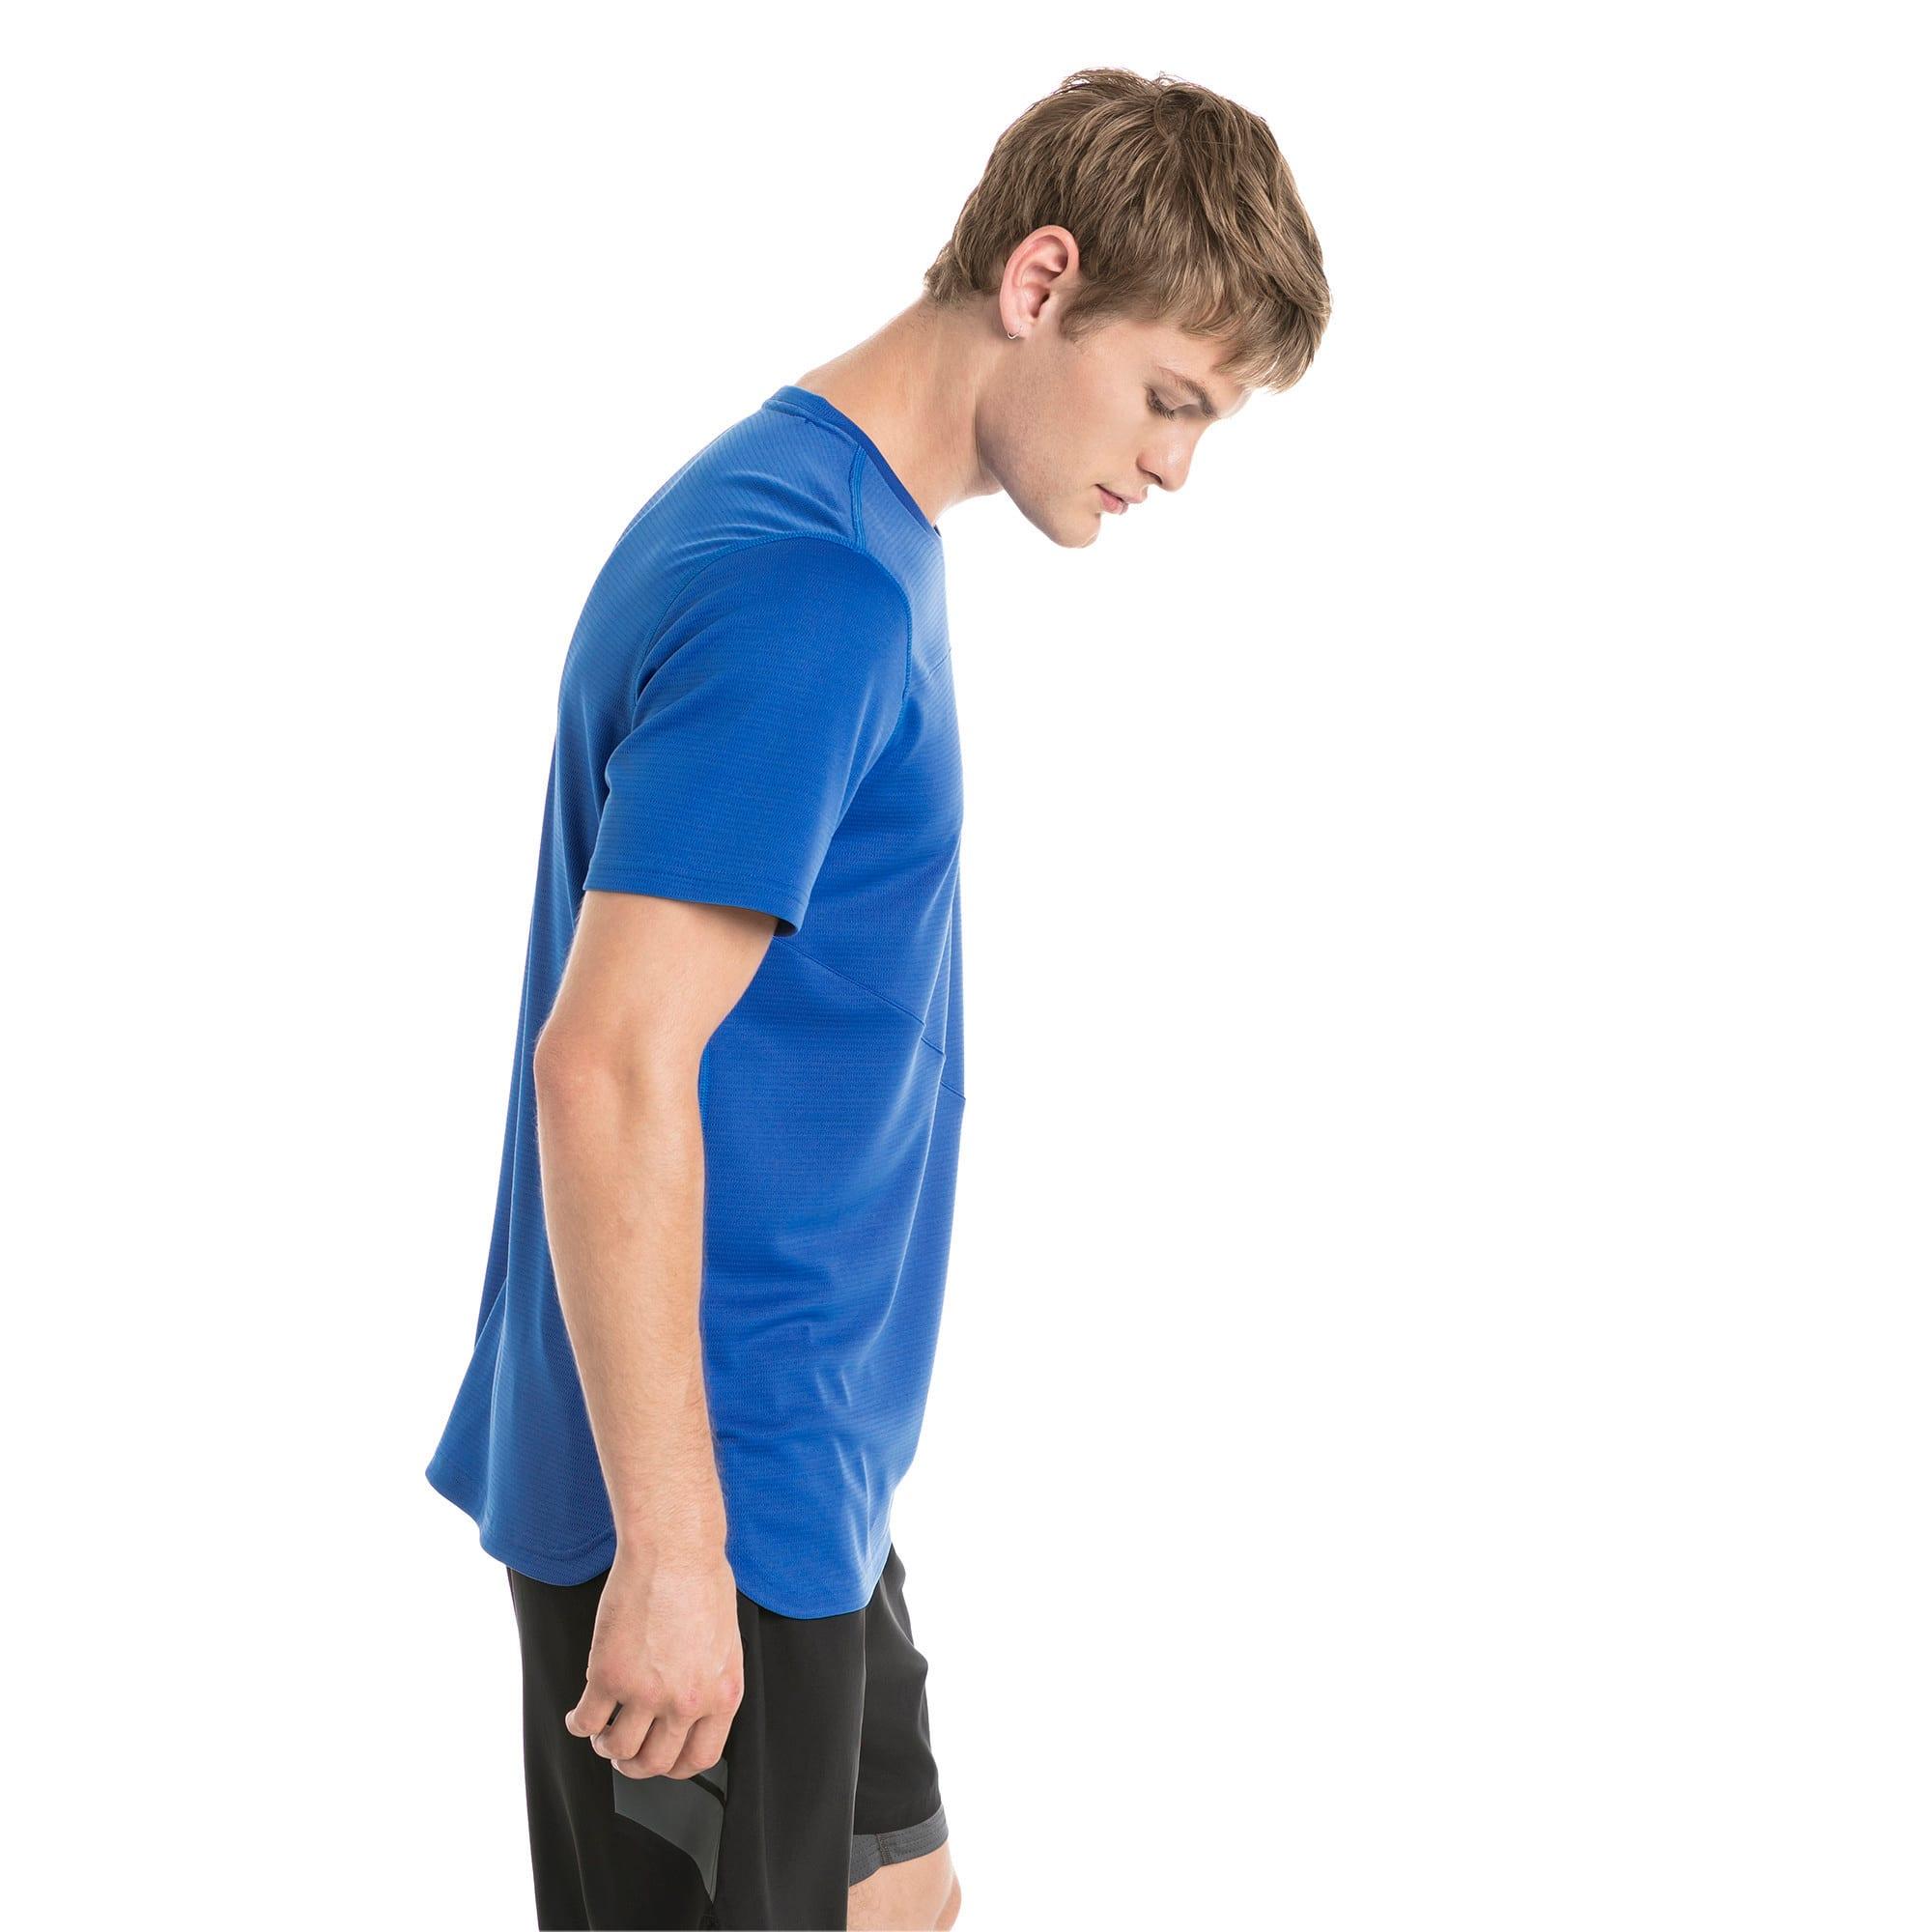 Thumbnail 1 of Running Men's IGNITE Mono T-Shirt, Strong Blue, medium-IND